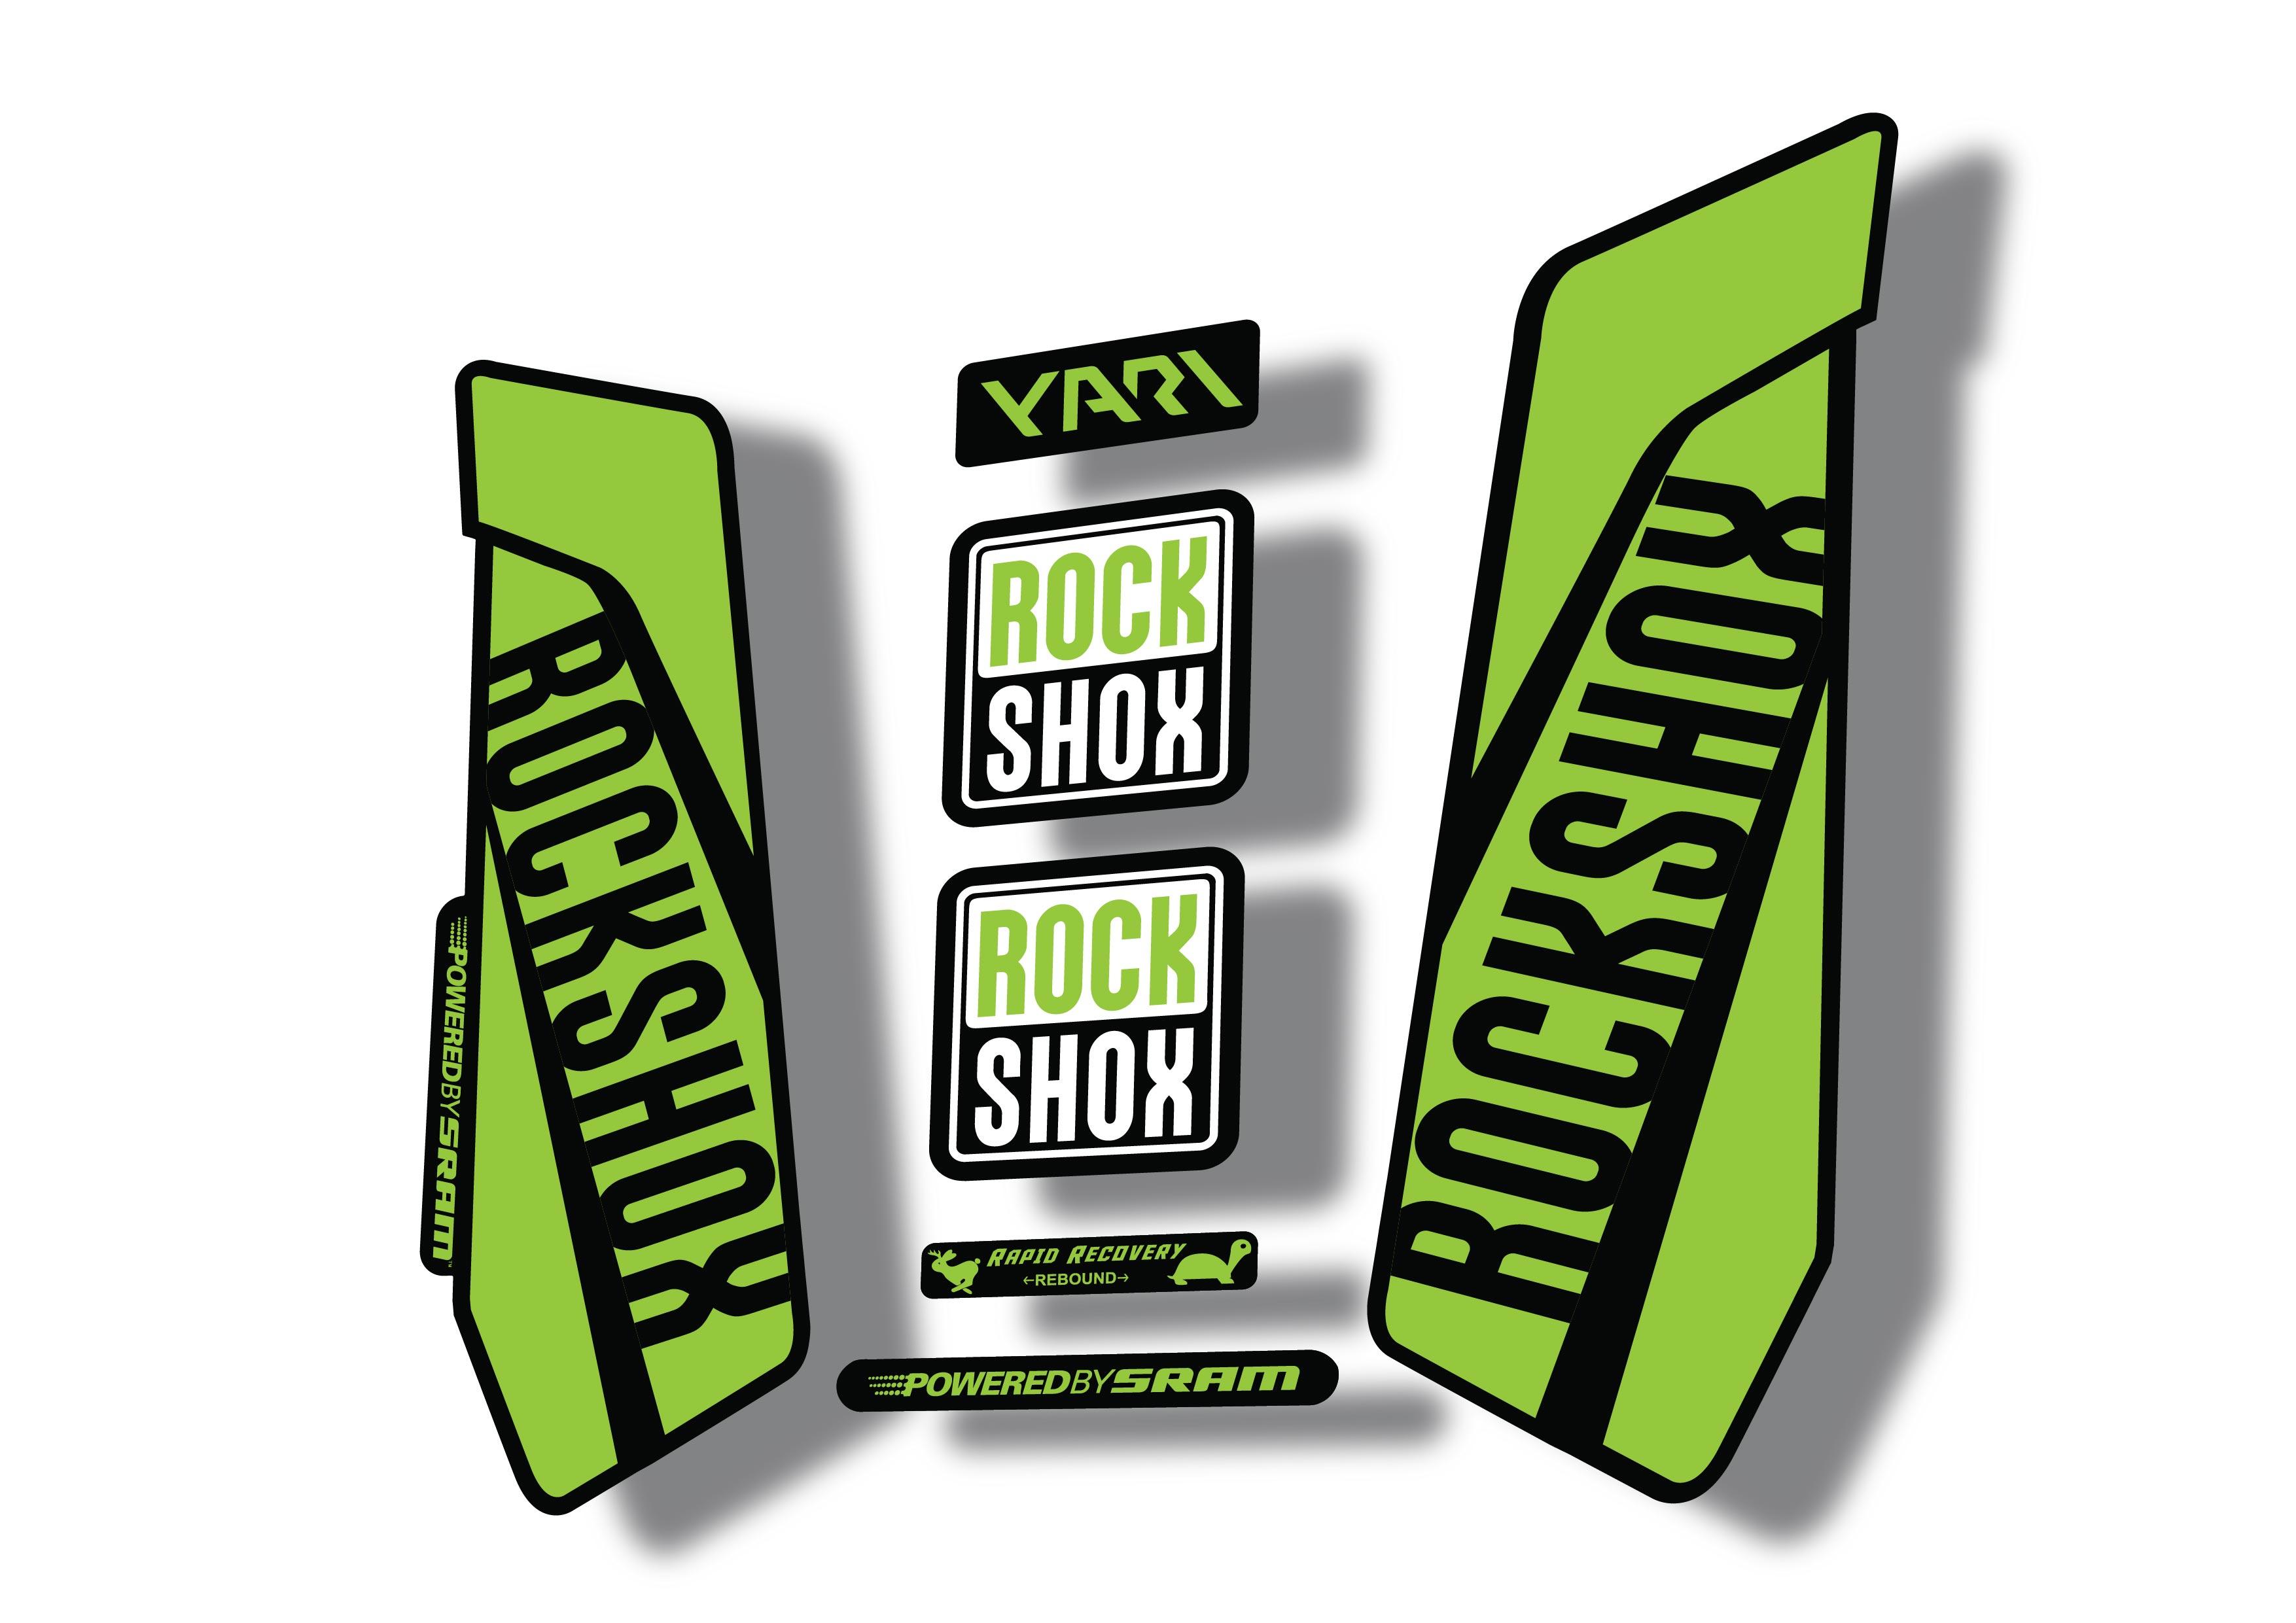 Rock Shox YARI 2015-16 Fork Decal Mountain Bike Cycling Sticker Lime Green